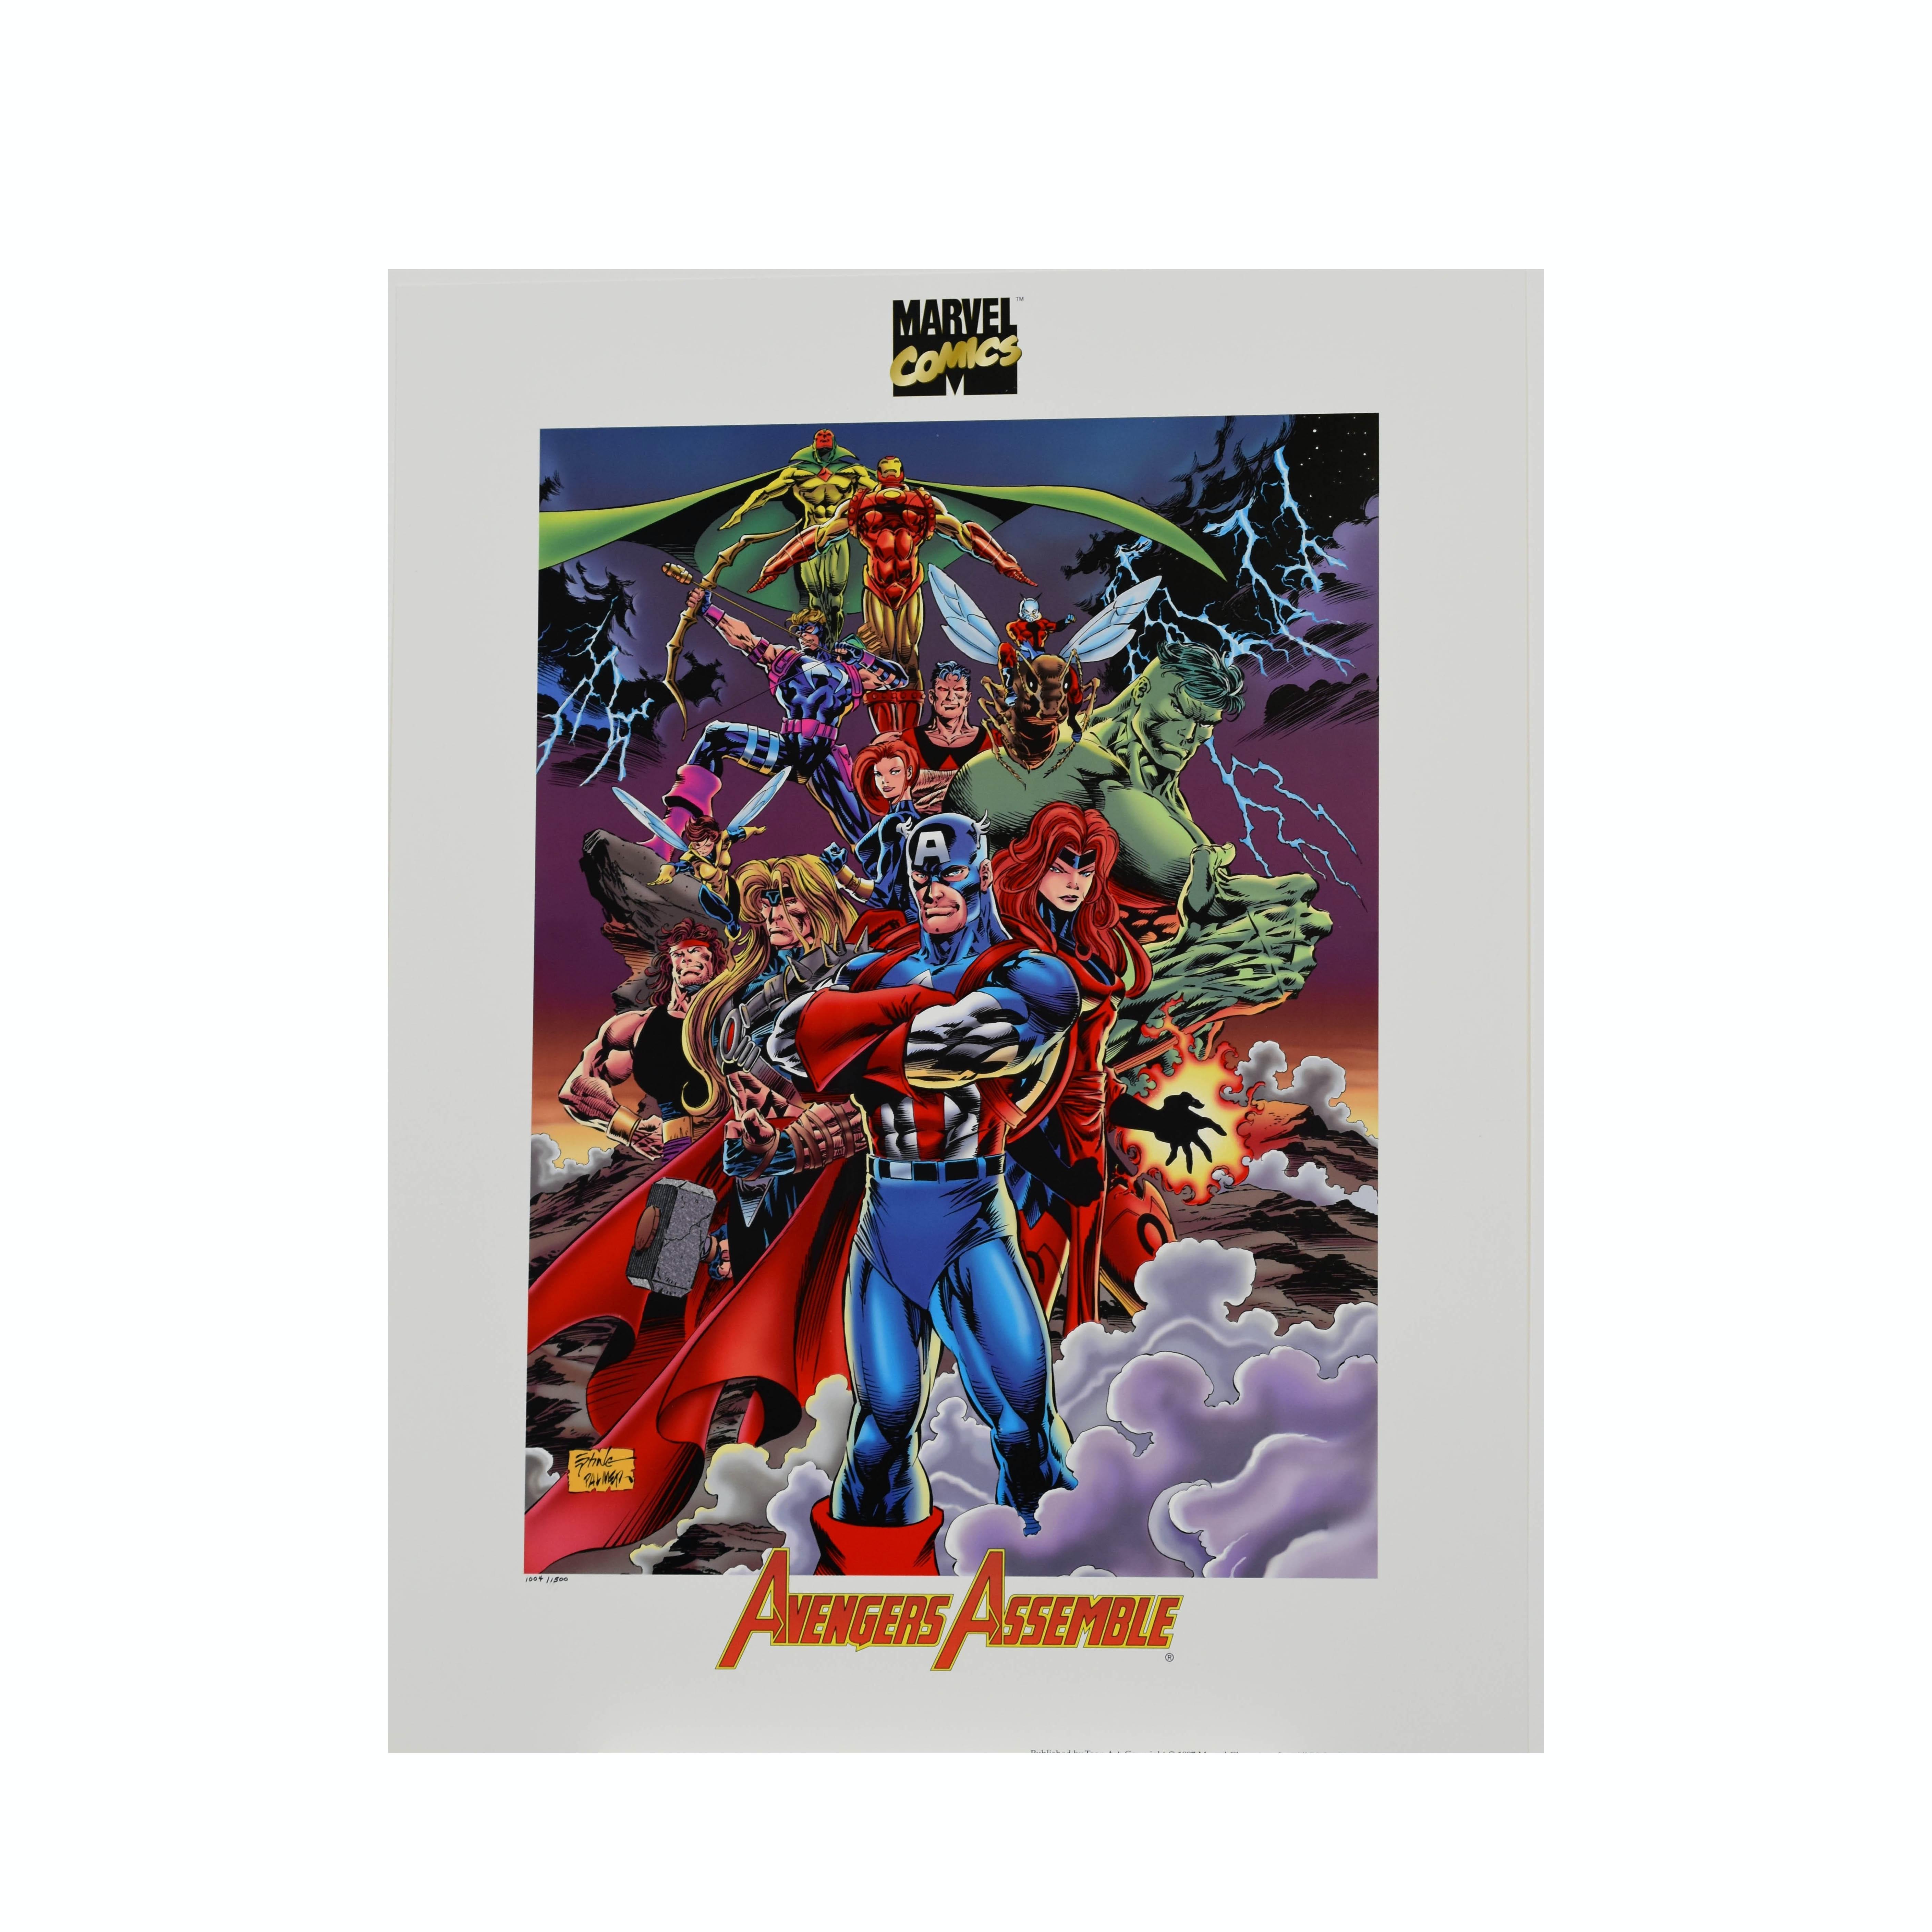 Avengers Assemble - L.E. Marvel Lithograph